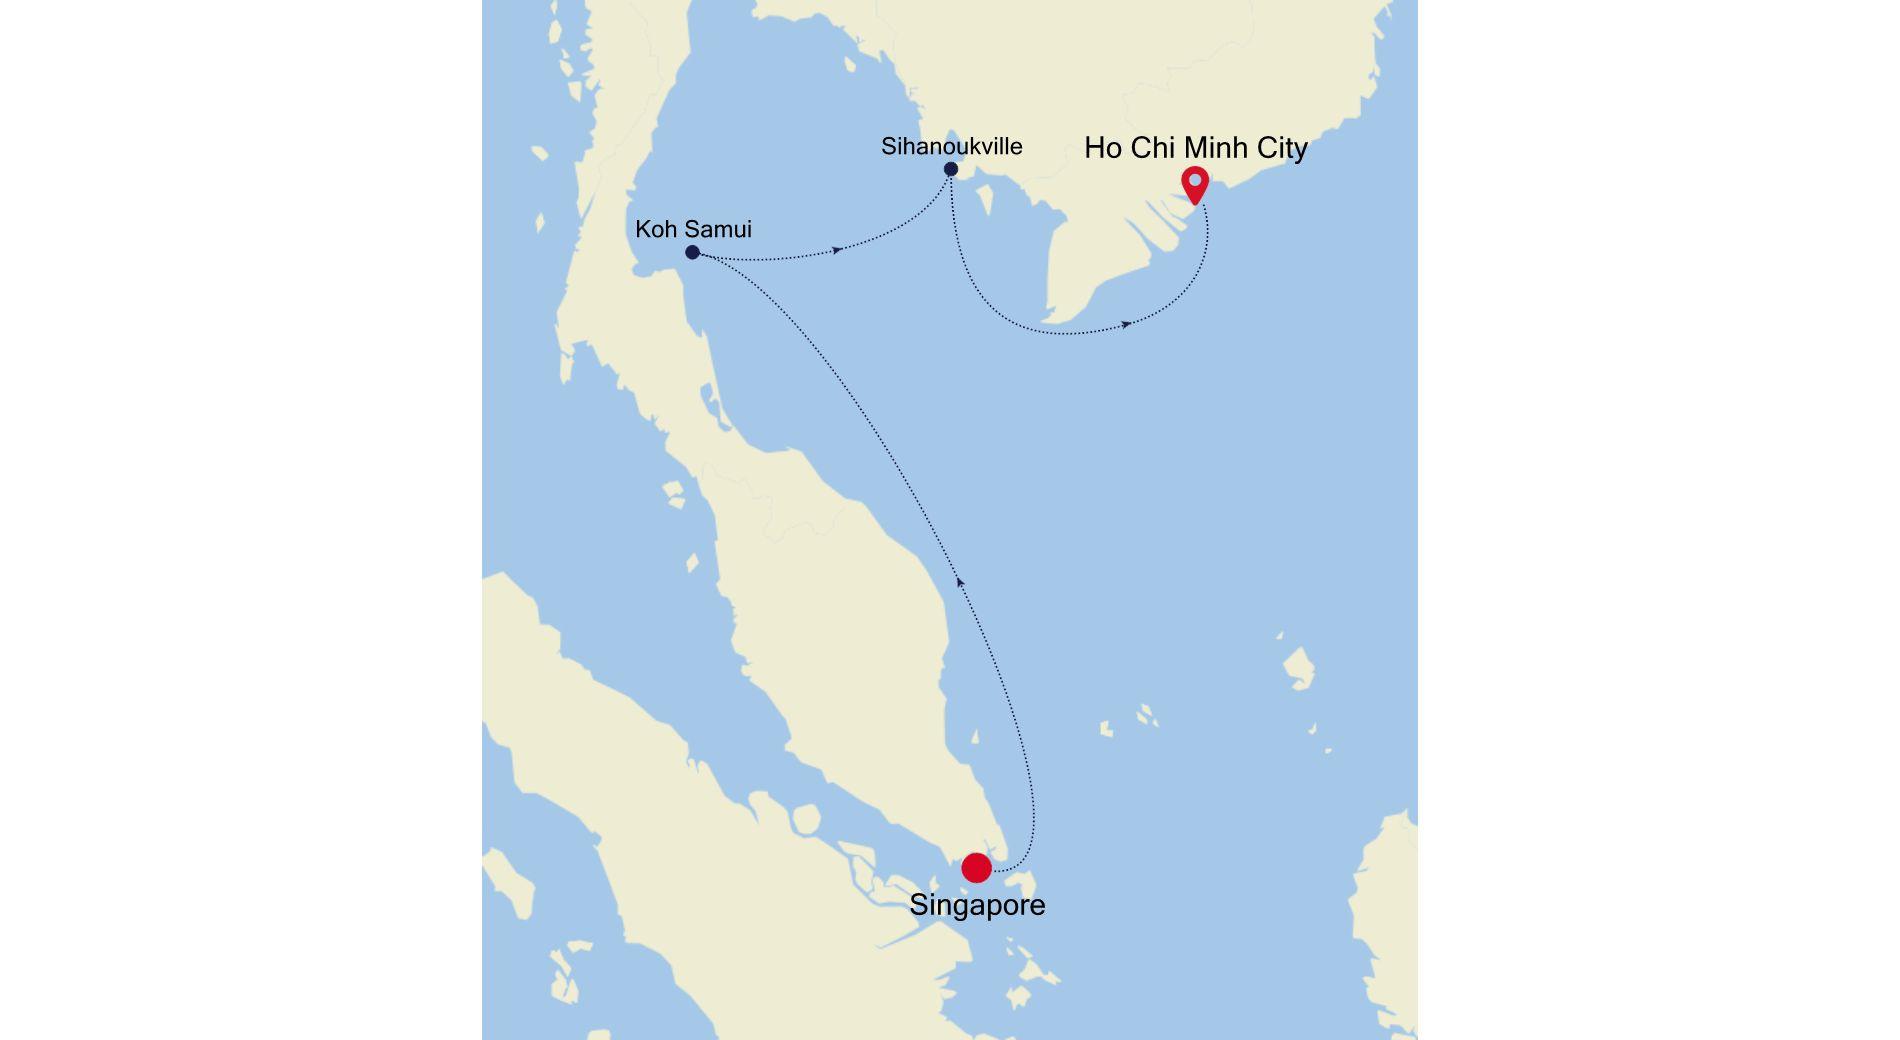 3905B - Singapore nach Ho Chi Minh City